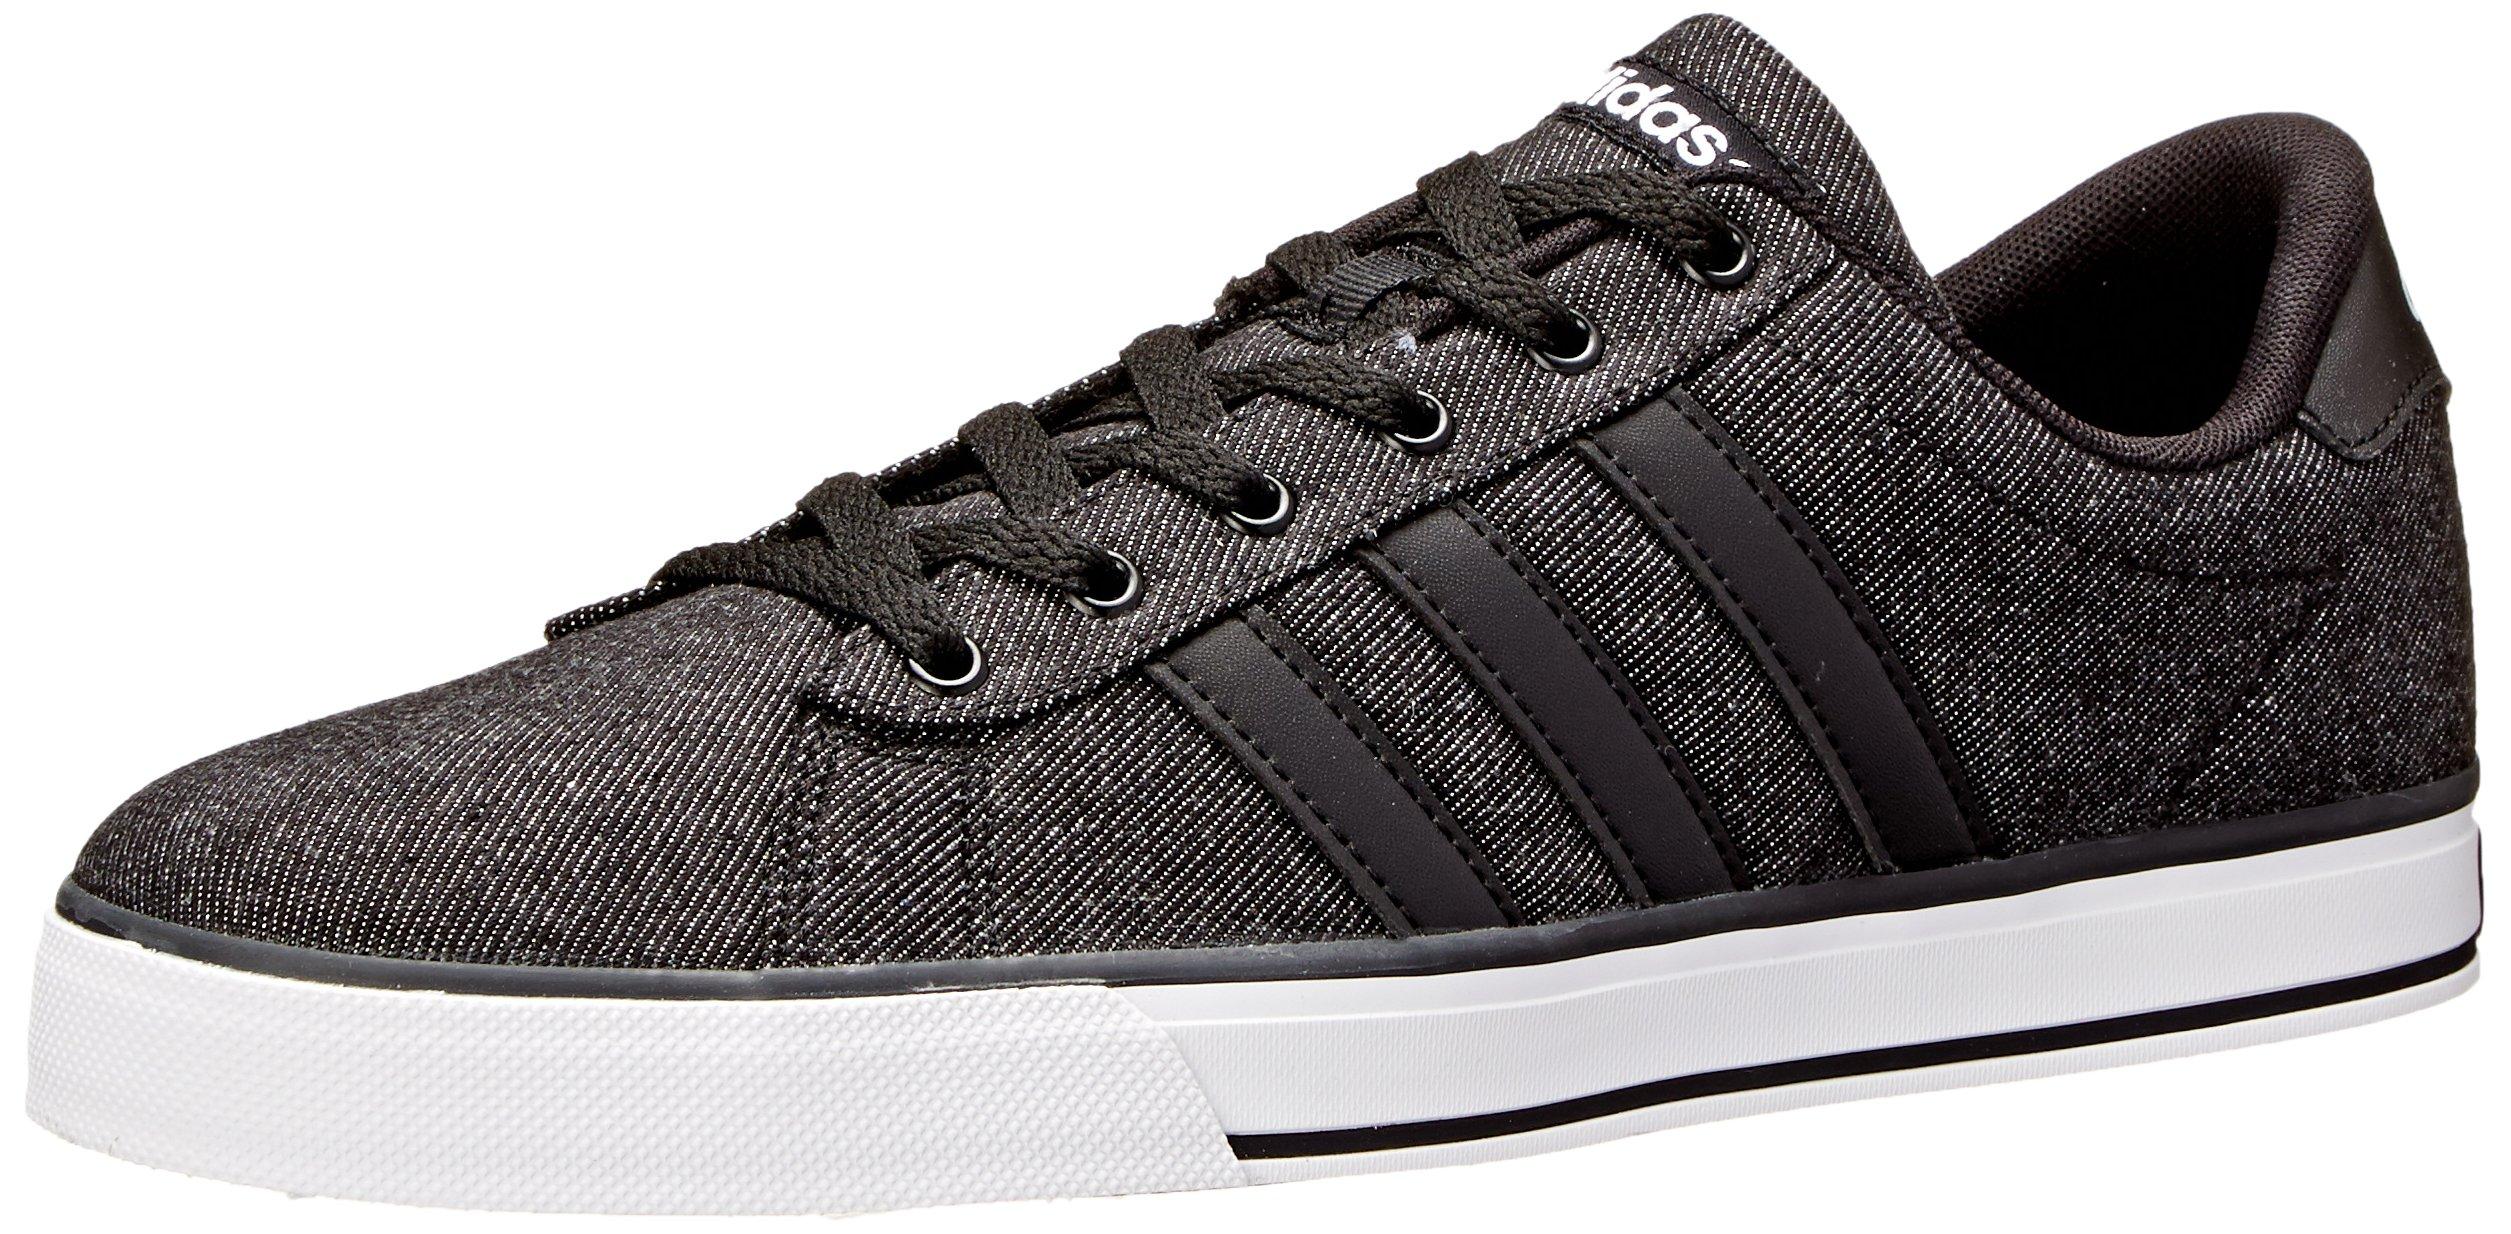 adidas Daily Lifestyle Skateboarding Black